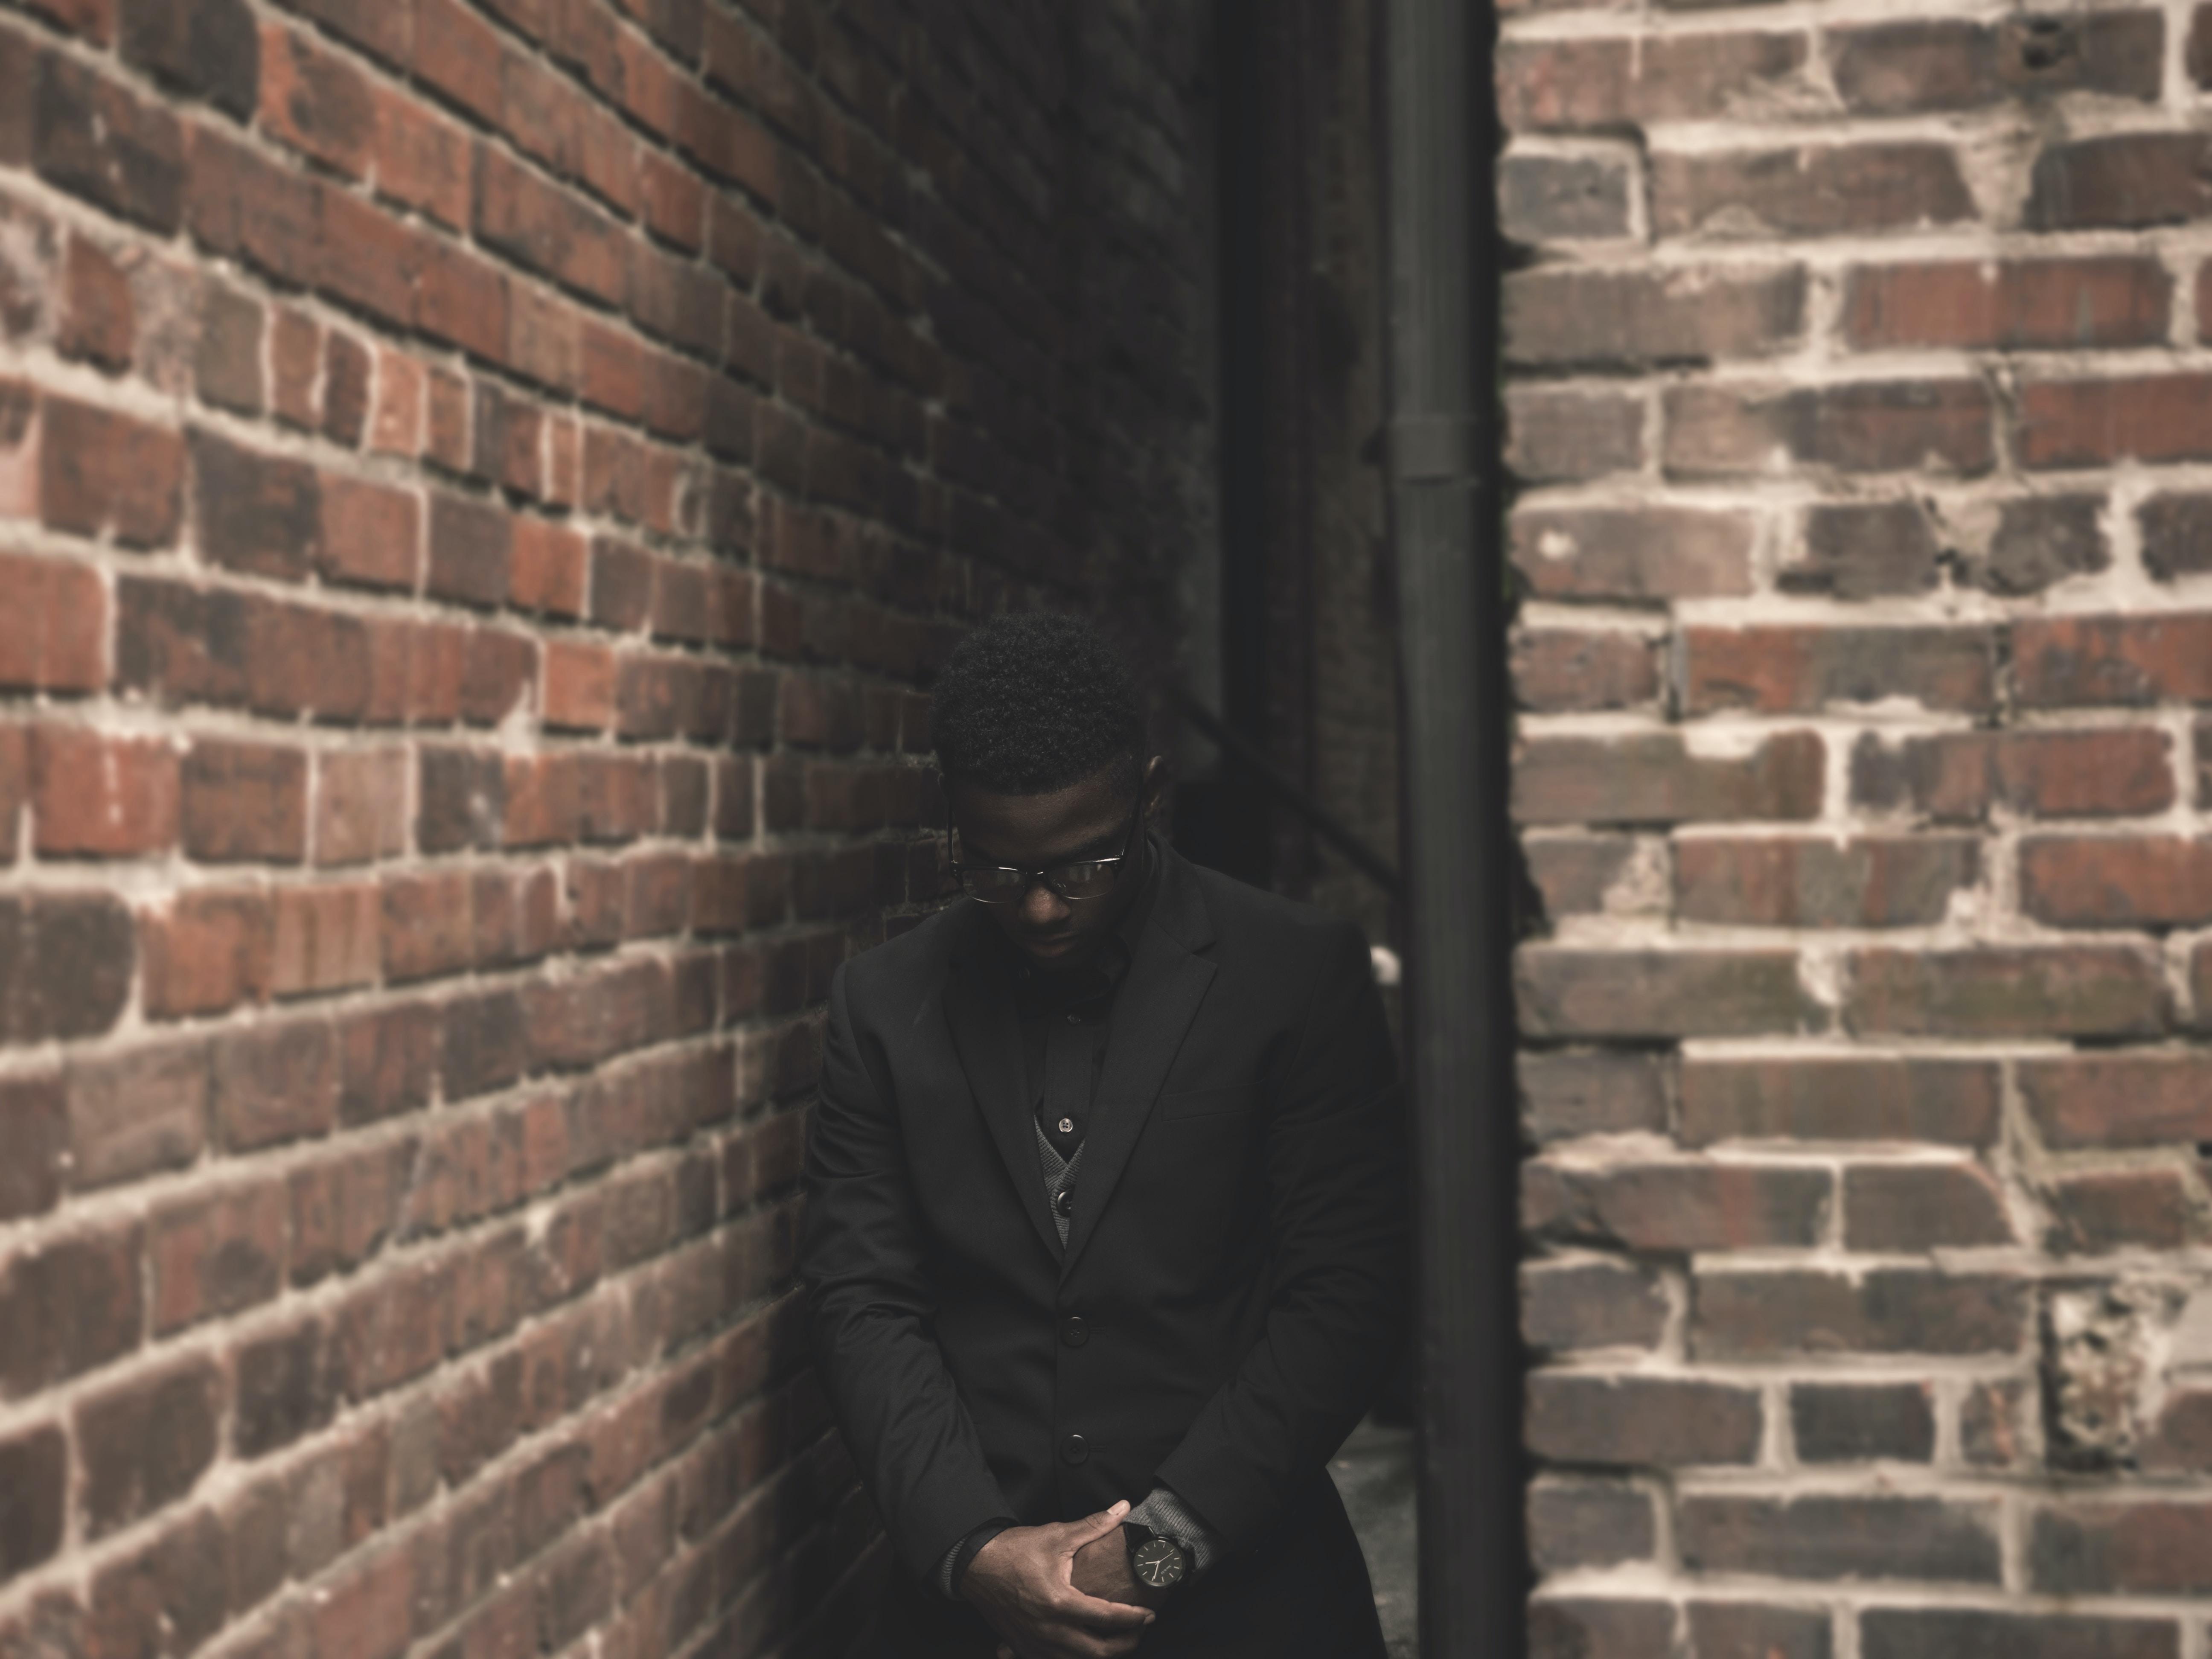 man in black suit standing on corner during daytime